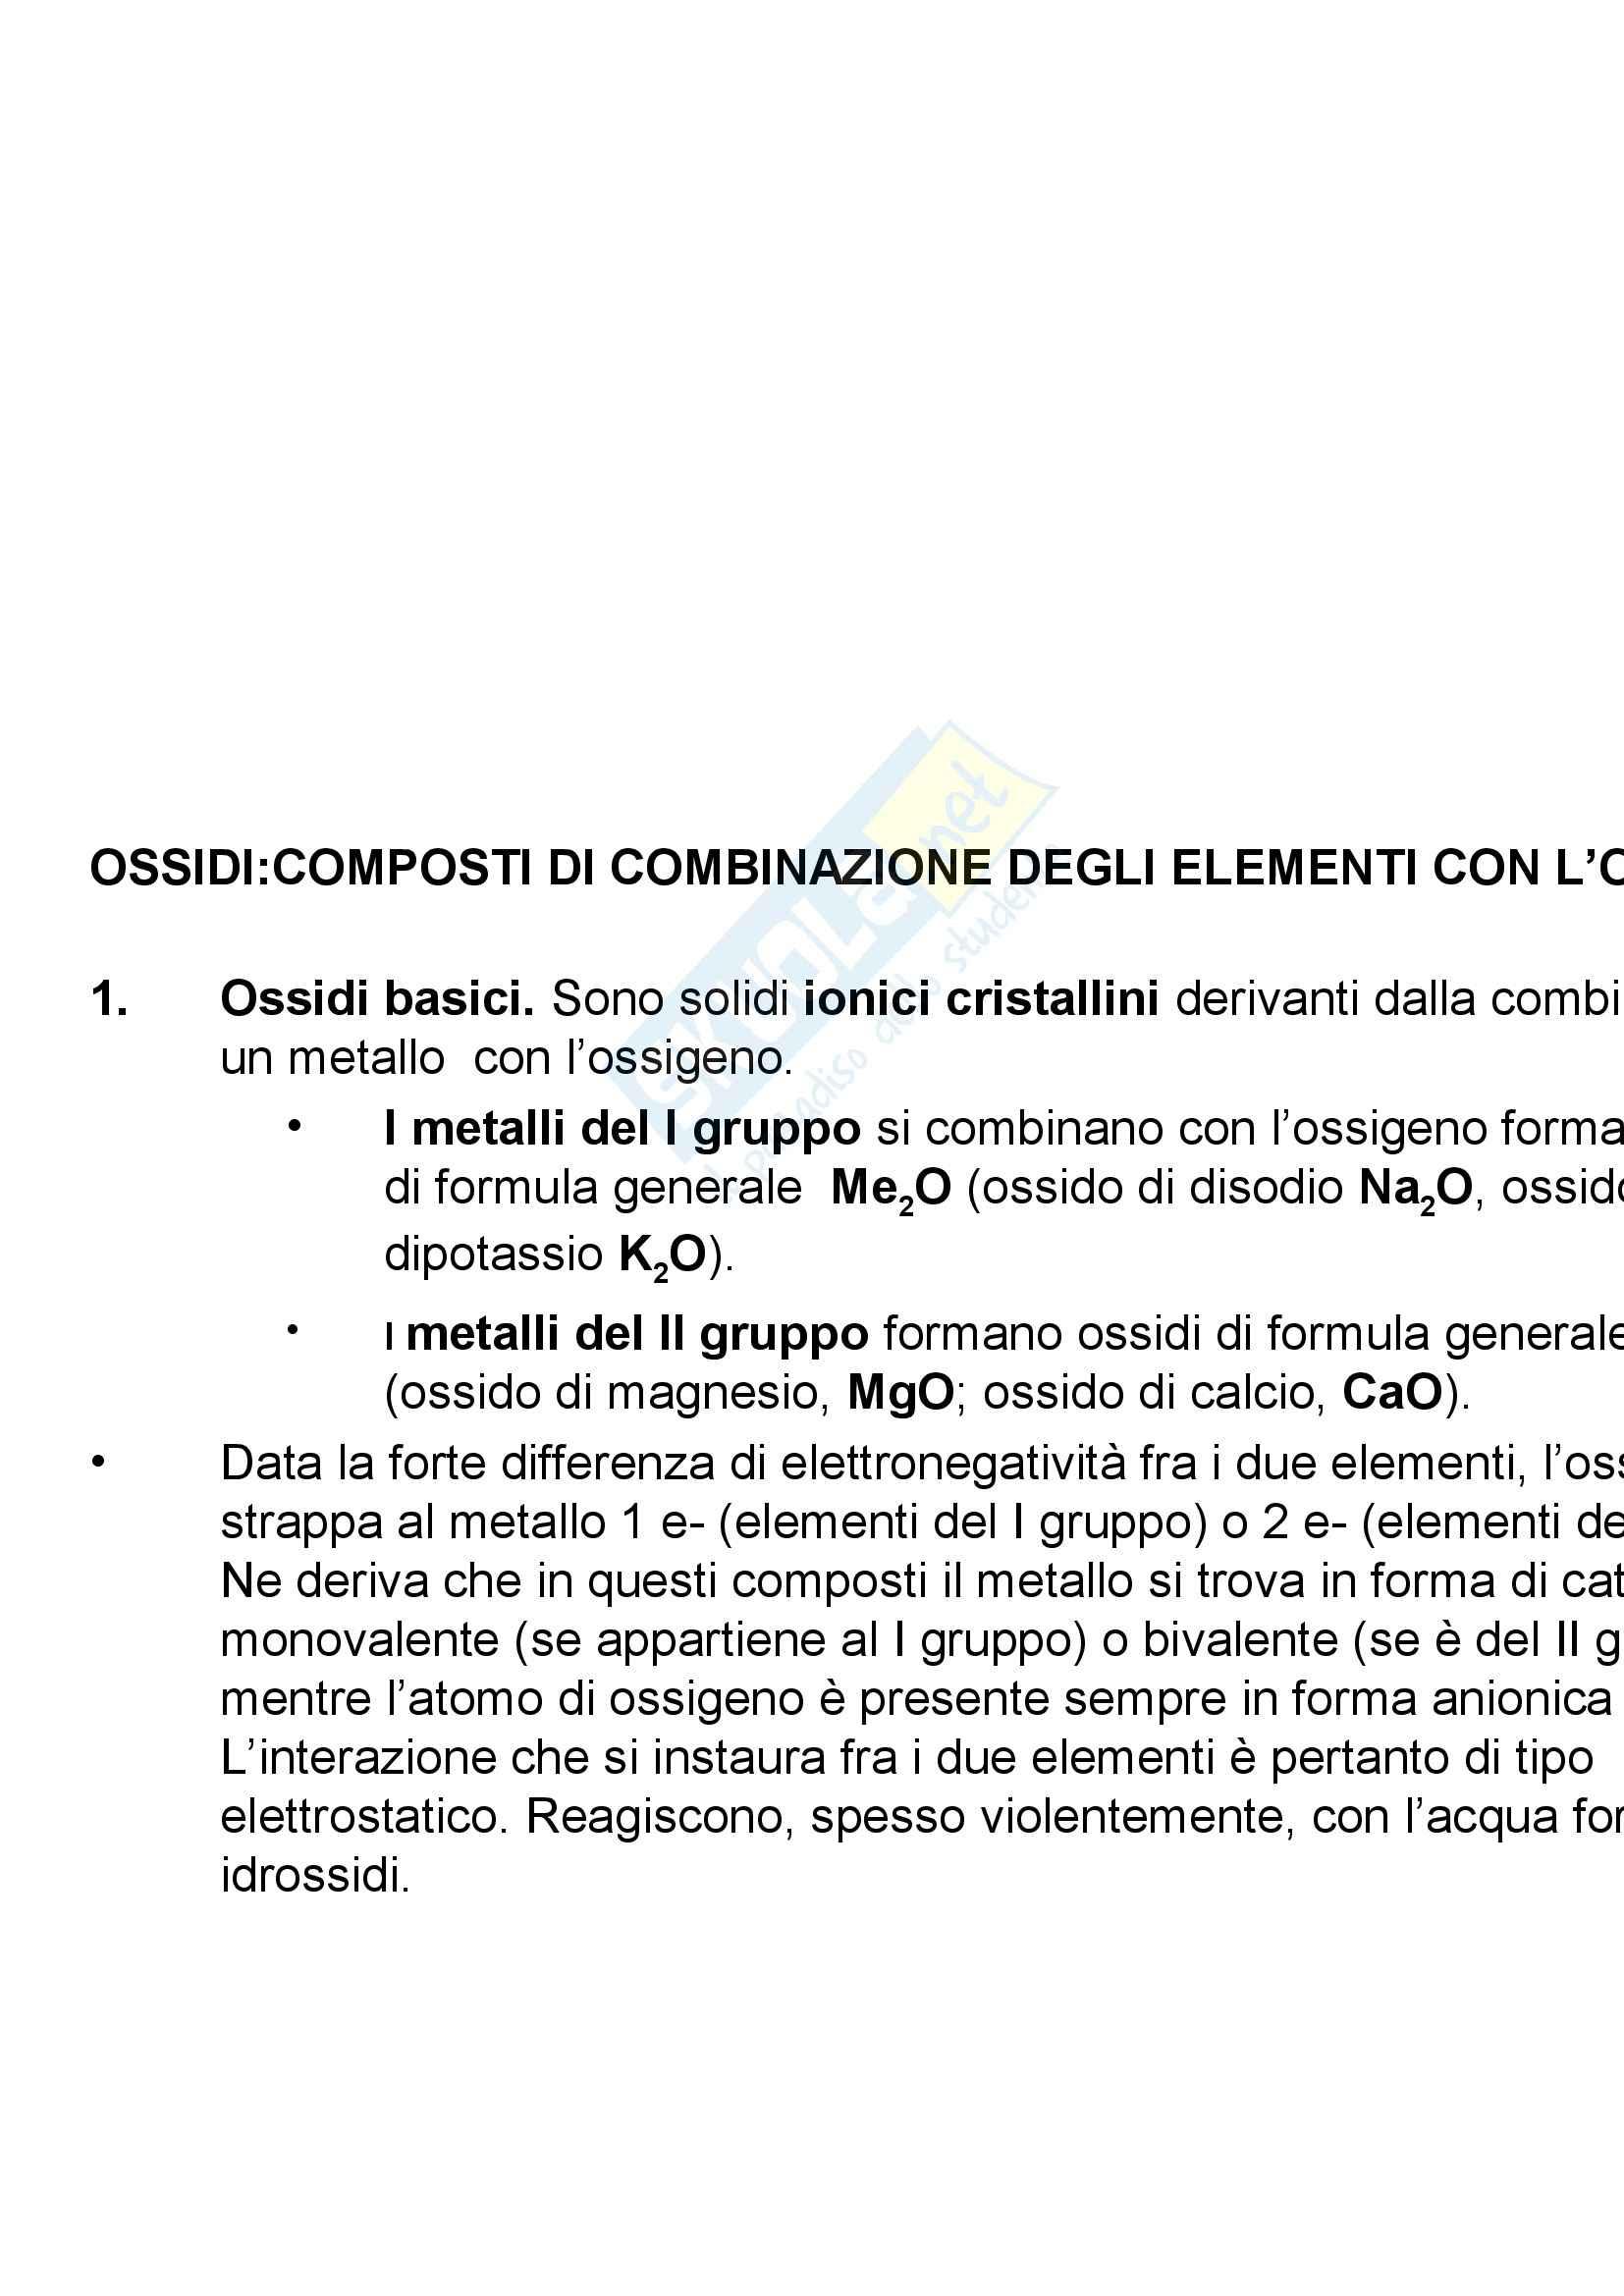 appunto G. Bruno Chimica inorganica